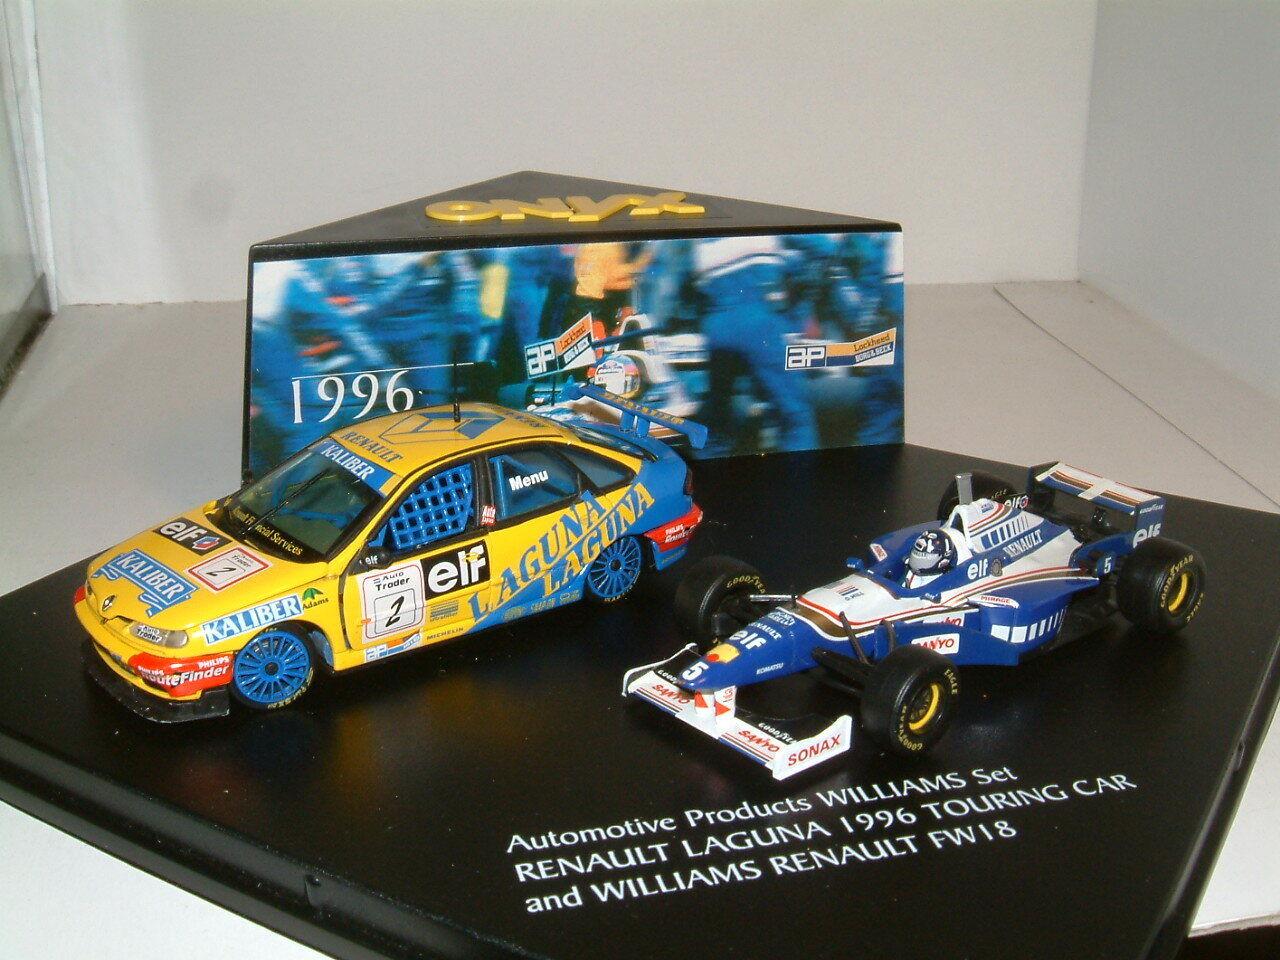 Conjunto de 1 43 Vitesse Onyx Williams, fórmula 1 FW18 y 1996 Renault Laguna Btcc